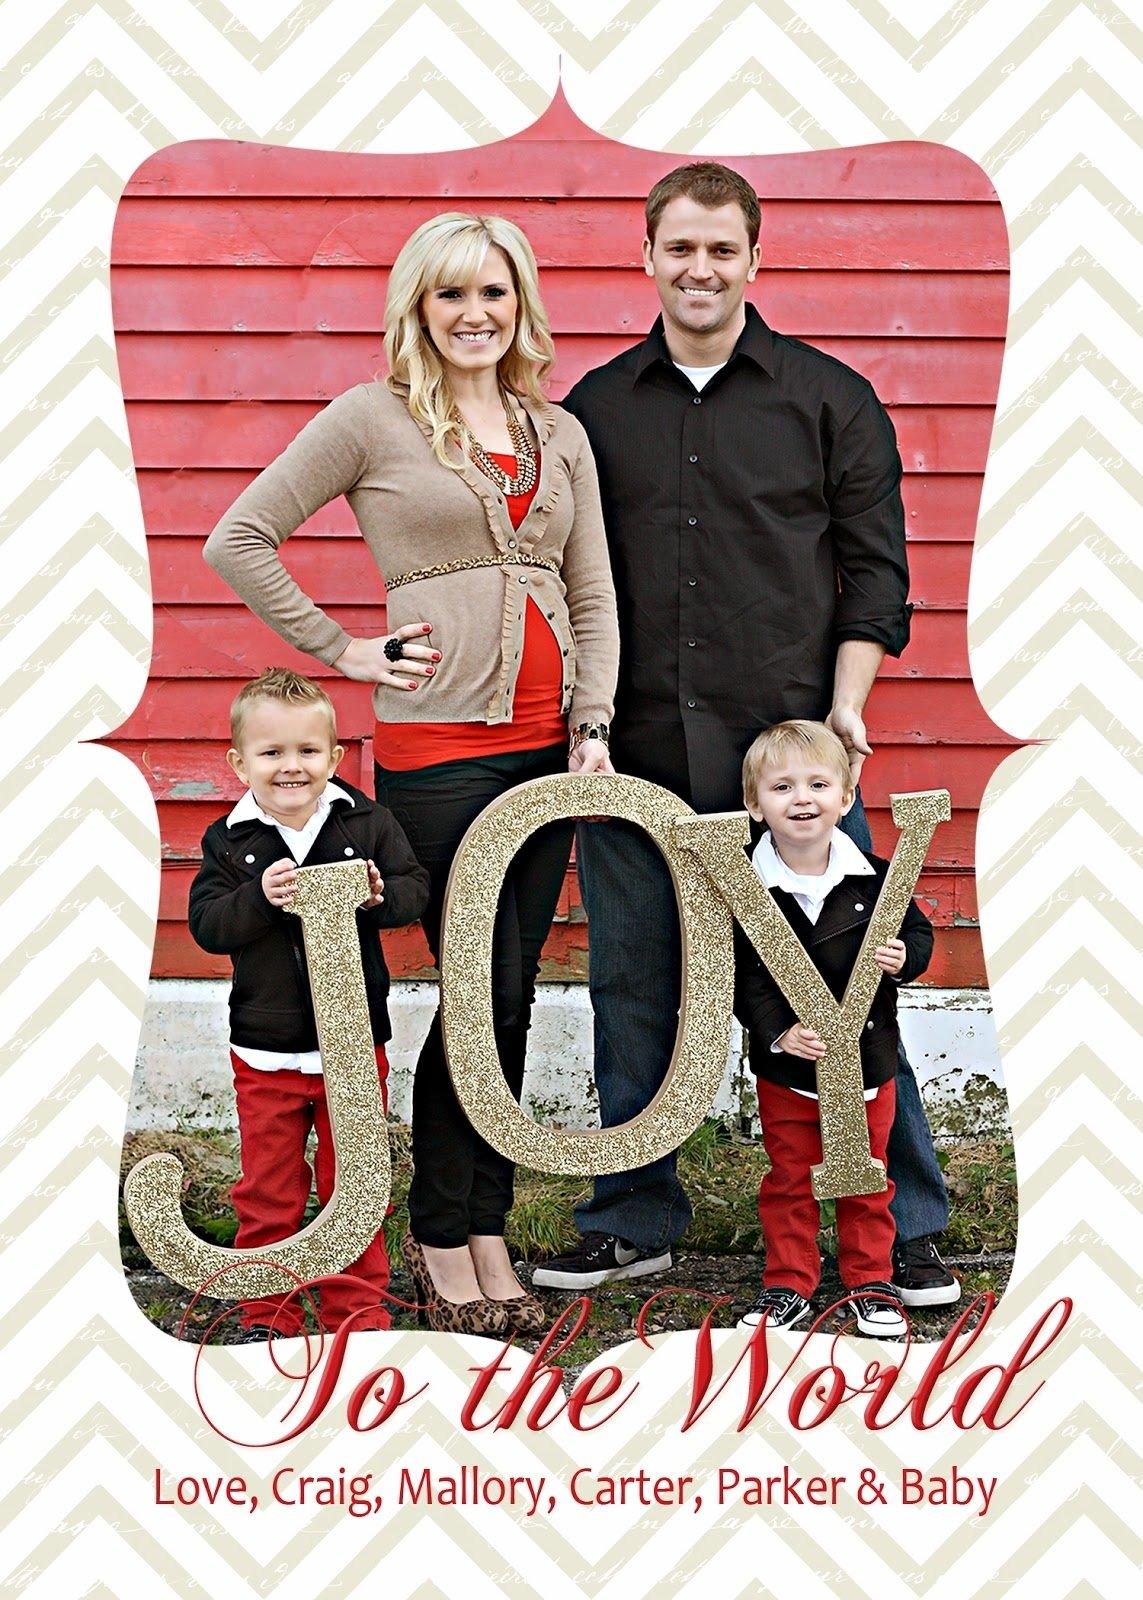 10 Unique Family Christmas Card Picture Ideas christmas card idea turned christmas decor classy clutter 2 2020